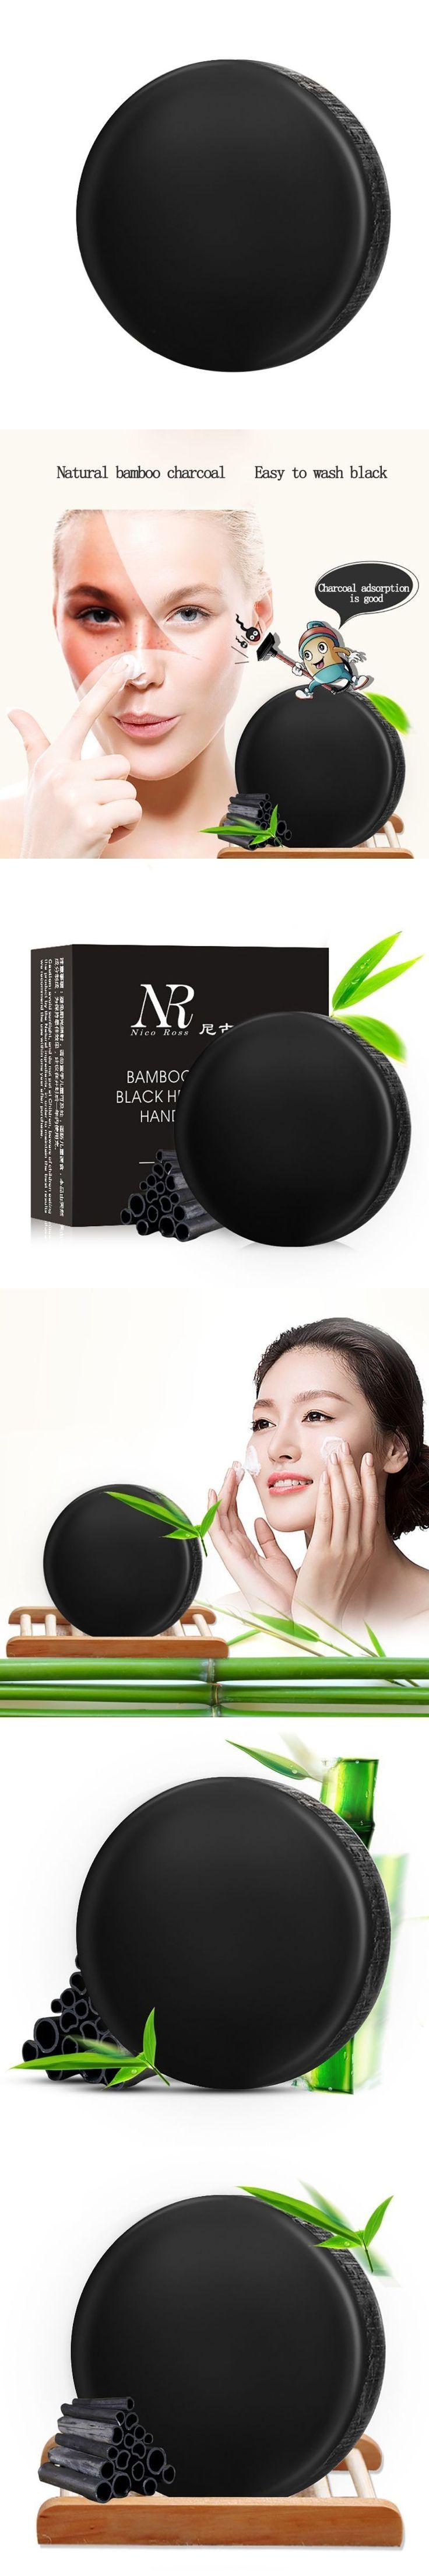 Bamboo Charcoal Soap Treatment skin care natural Skin whitening soap blackhead remover acne treatment